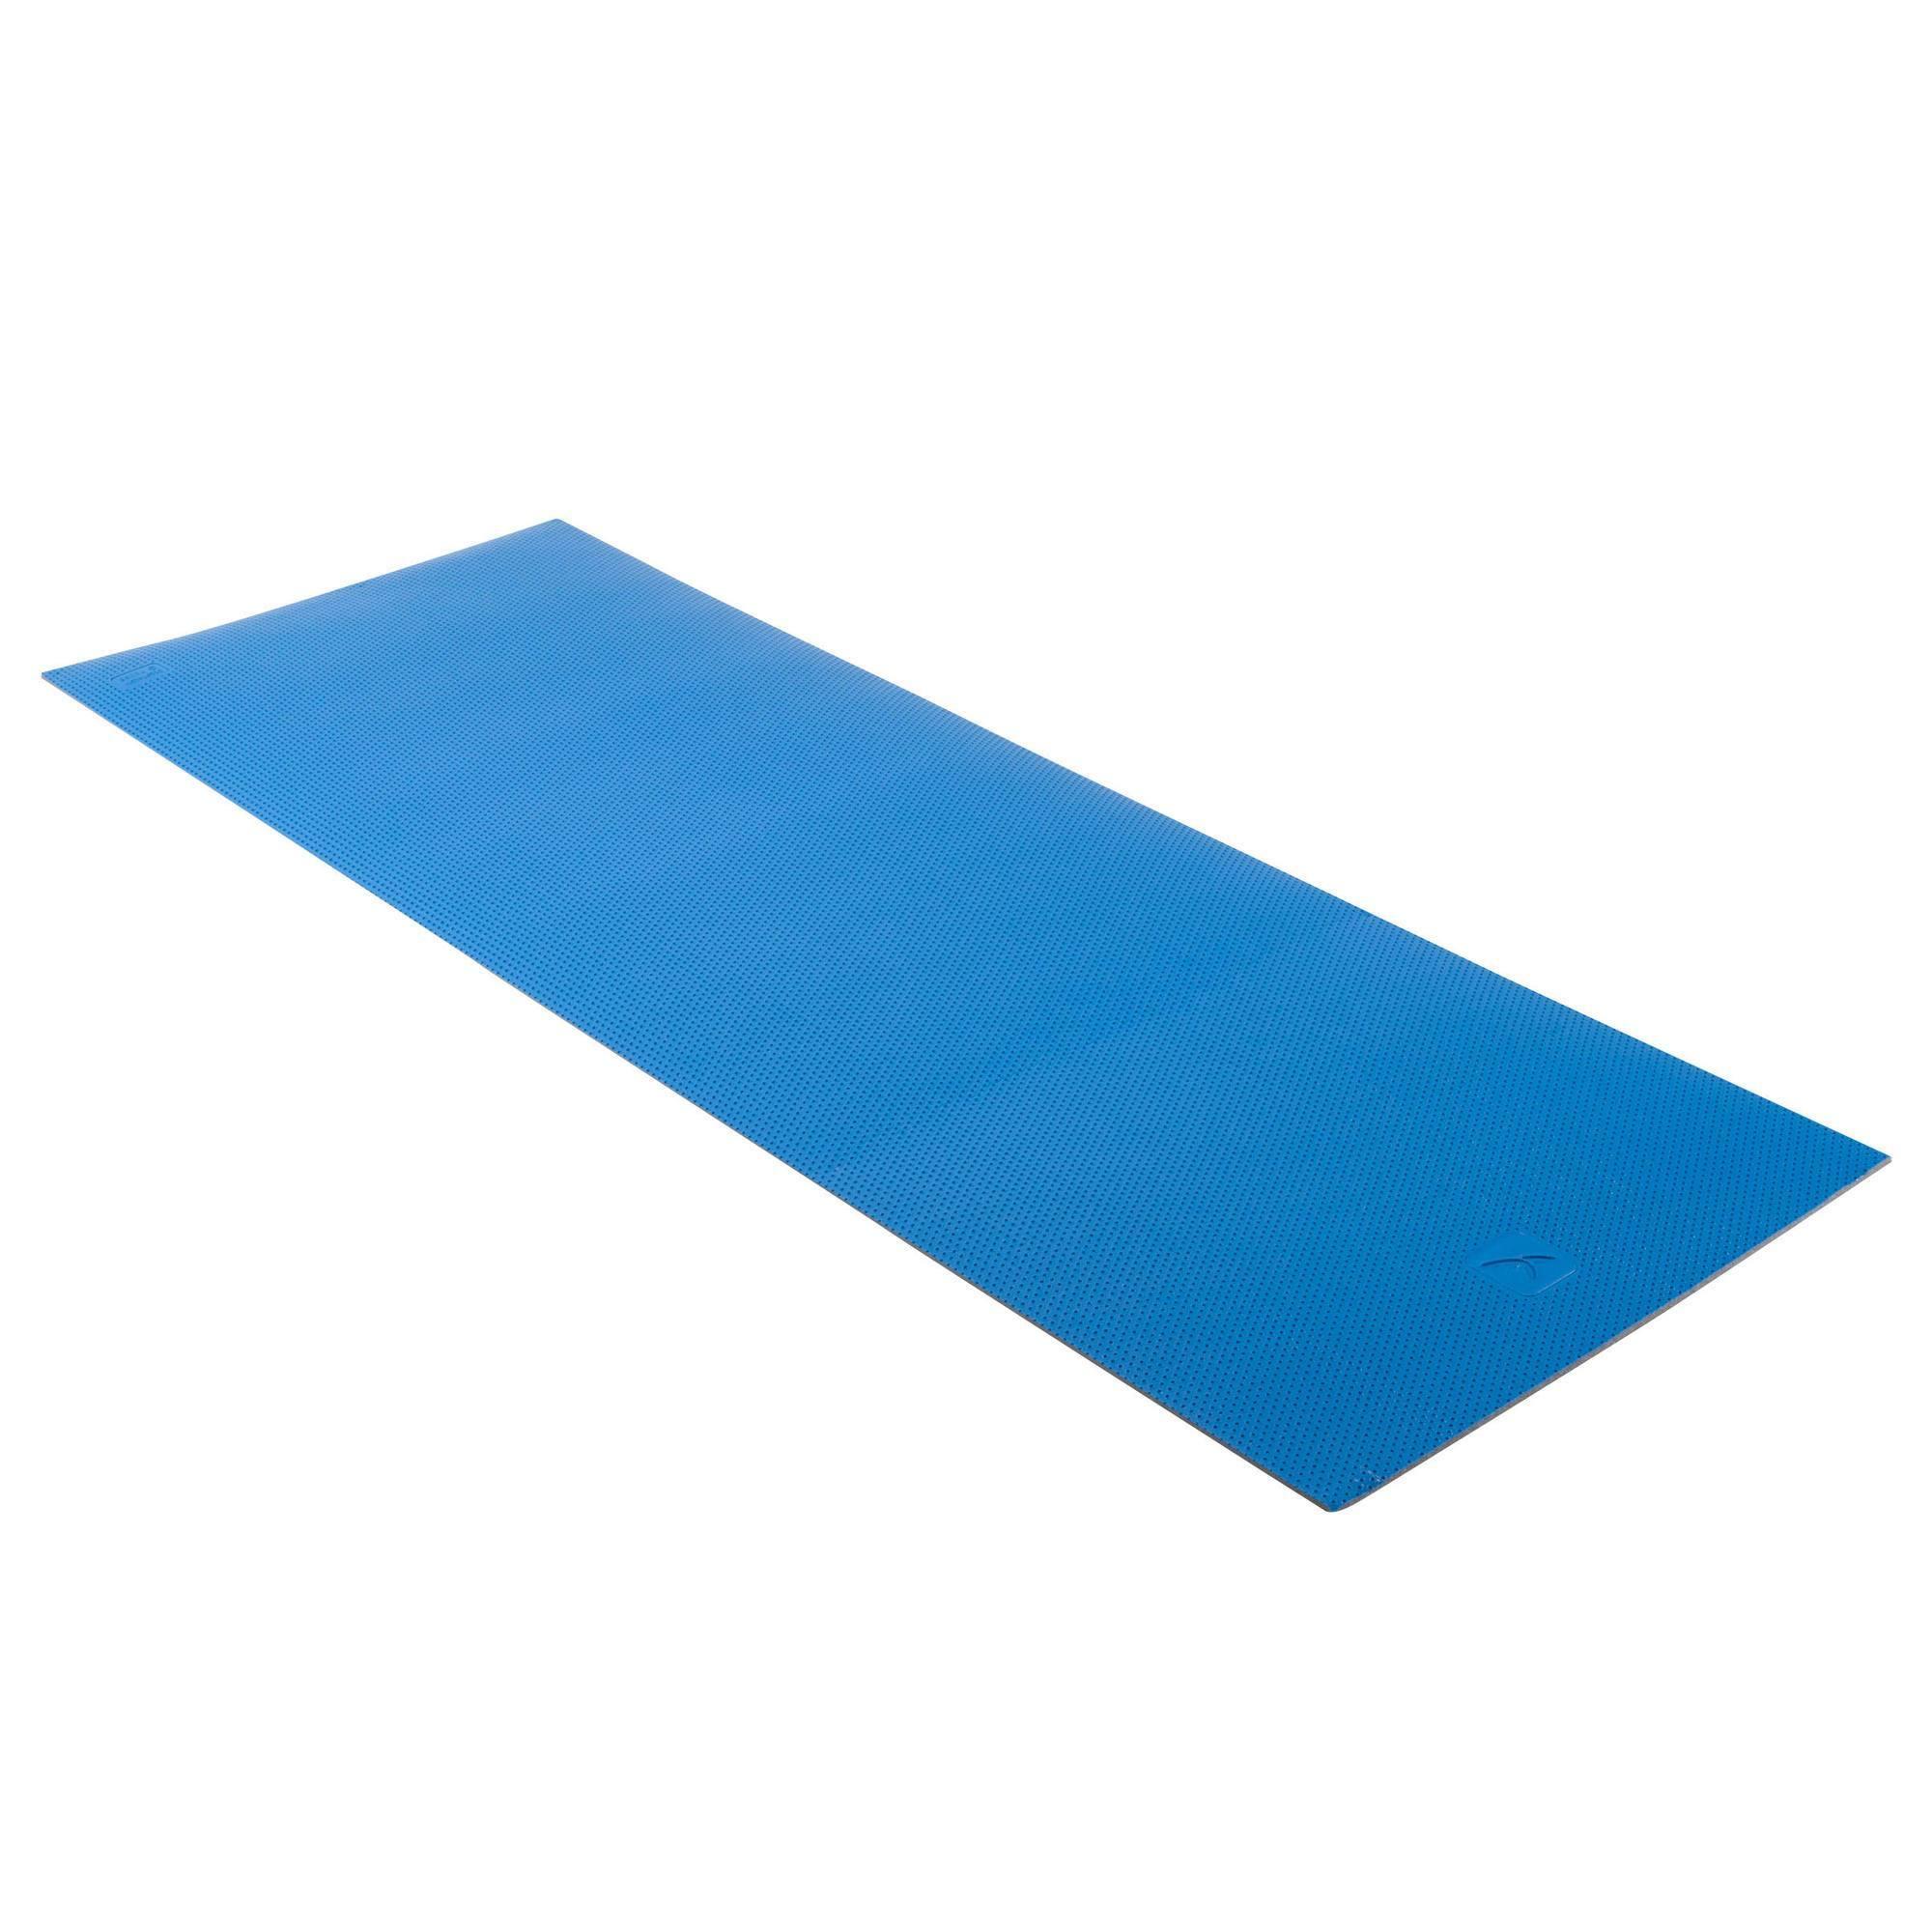 Tapis Gym Pilates 500 Bleu Clubs Collectivit S Decathlon Pro